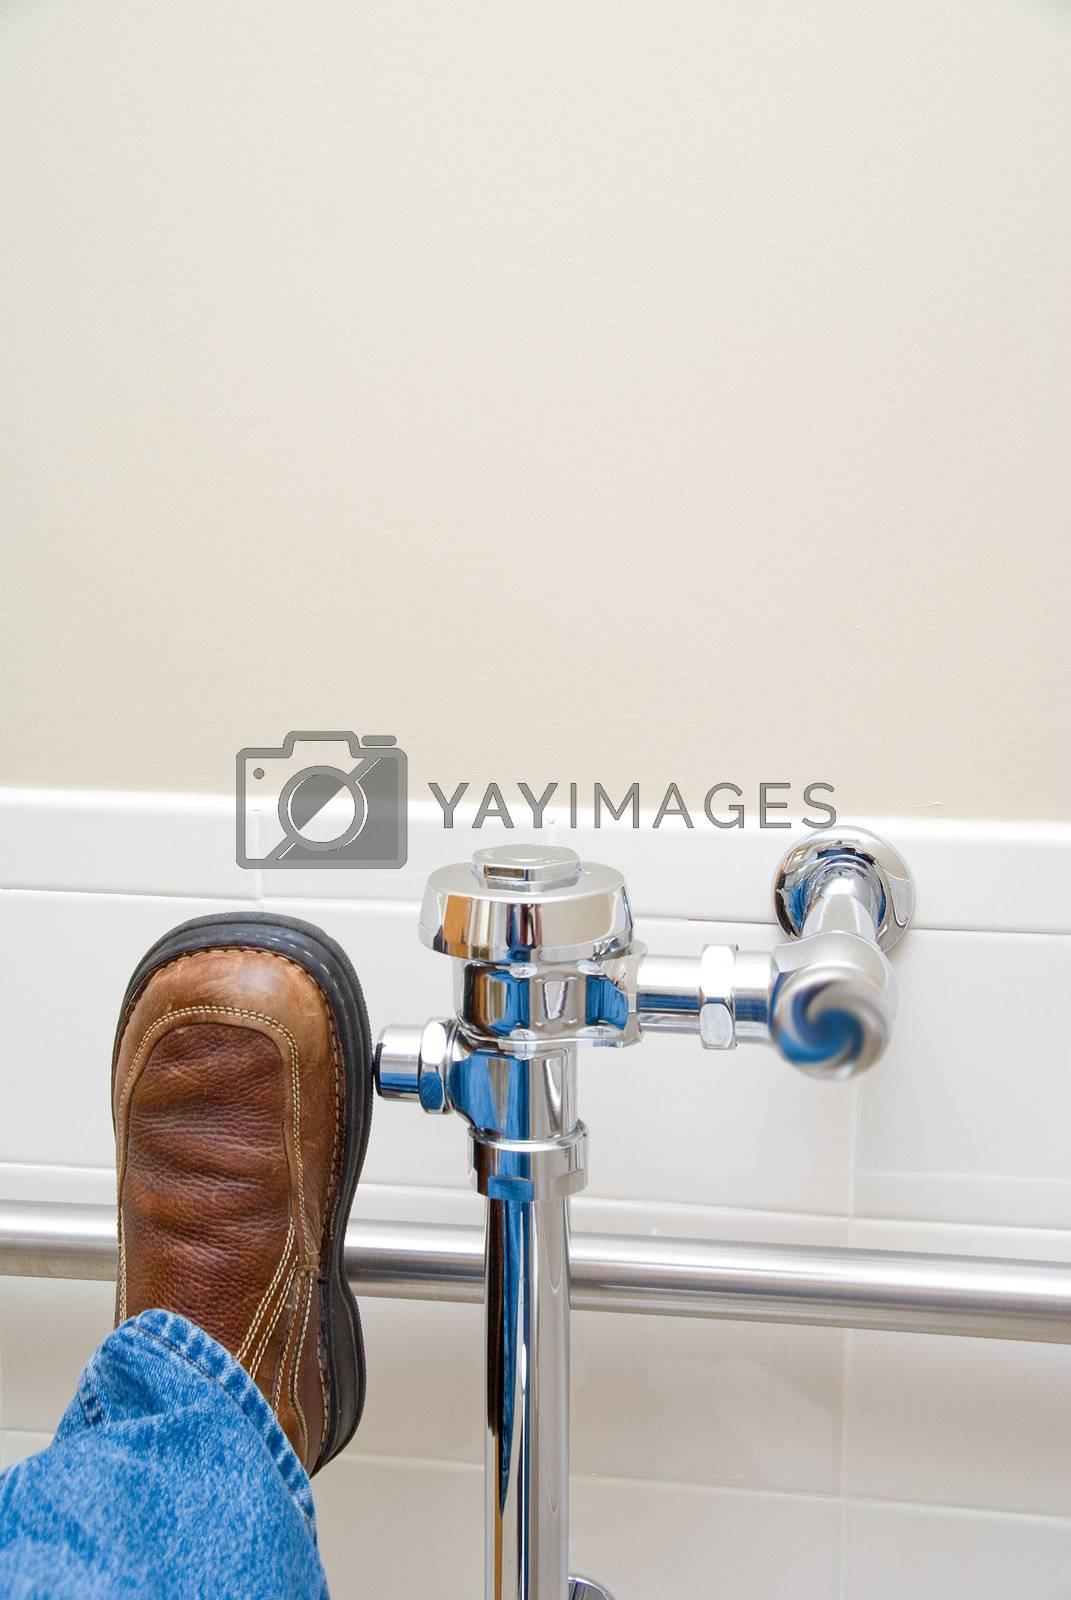 A persons shoe flushing a public toilet.